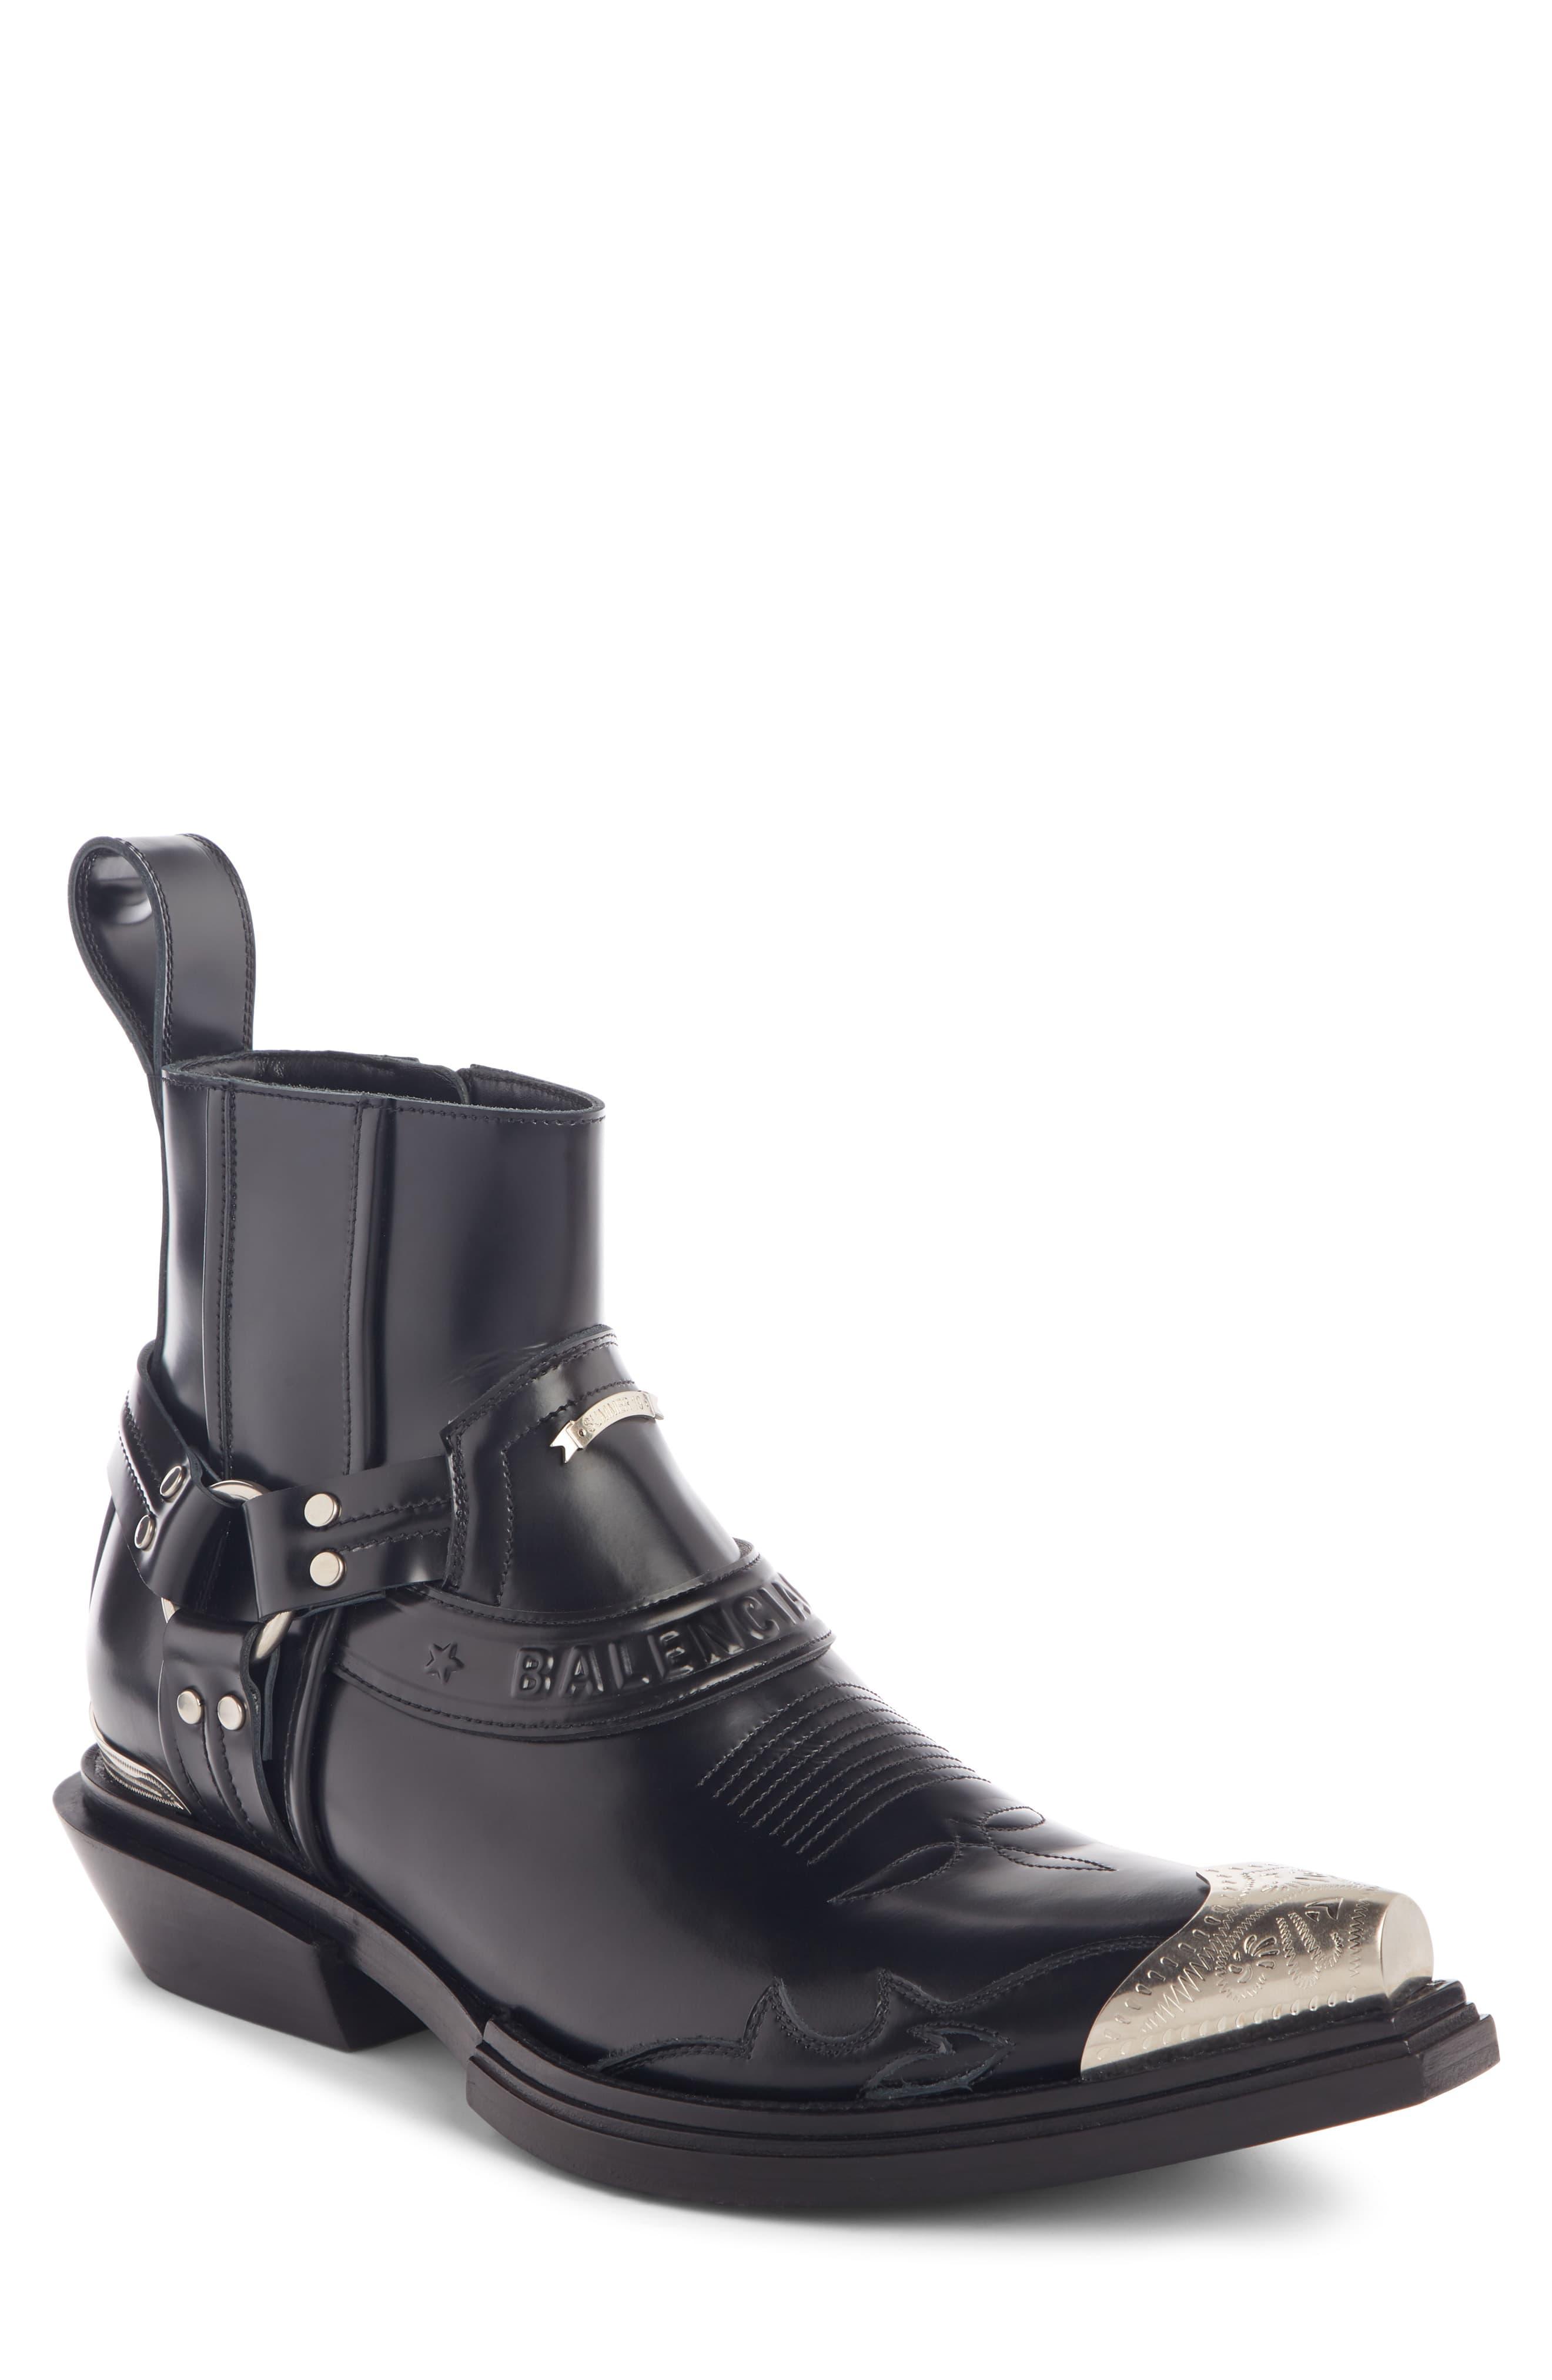 Men's Balenciaga Santiag Harness Boot, Size 9US 42EU